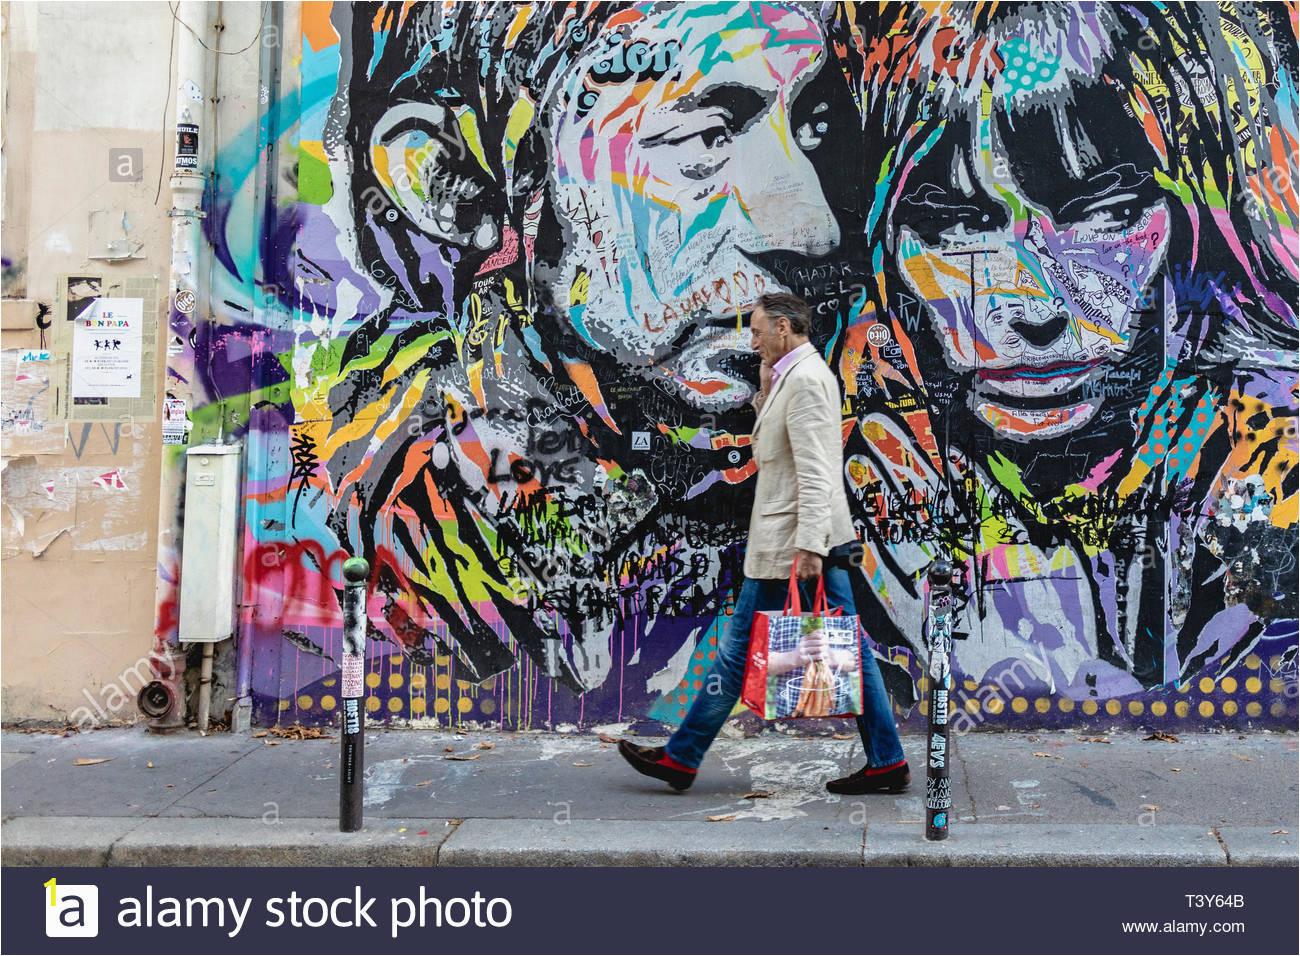 street art fassade von serge gainsbourgs house rue de verneuil august 24 2018 paris frankreich street art fassade de la maison de serge gainsbourg t3y64b